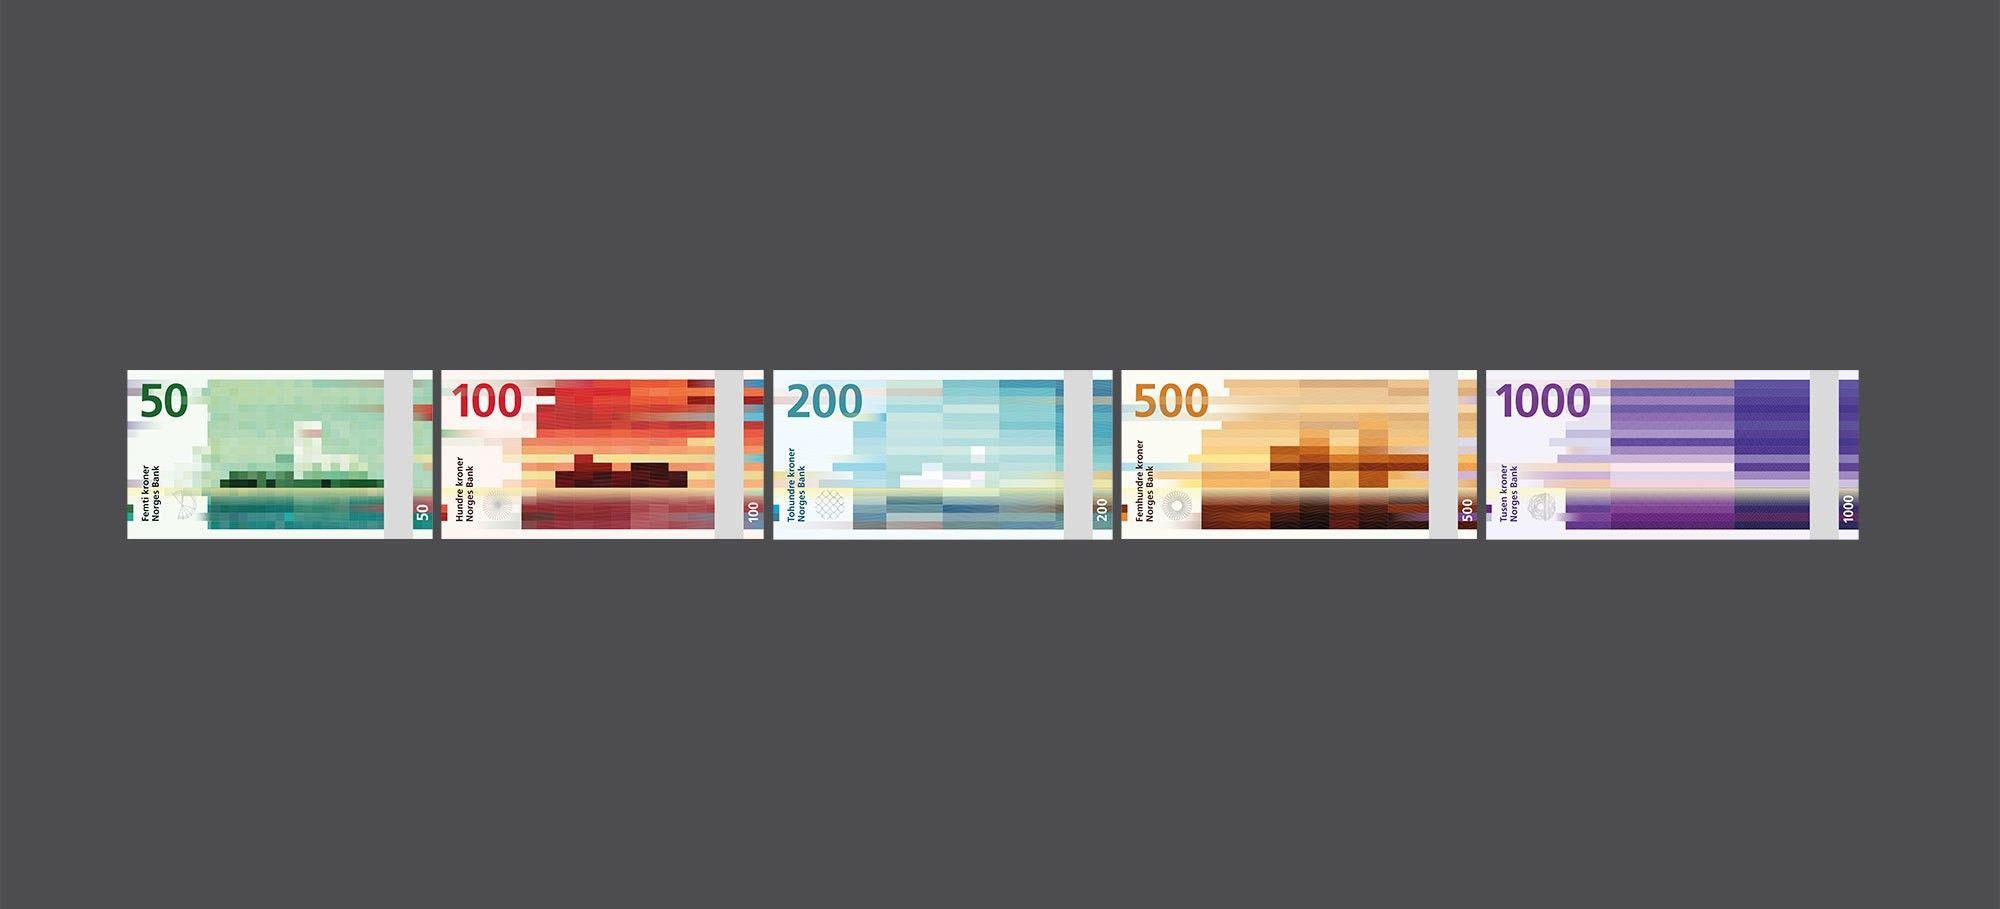 Winning design proposal for the new Norwegian money bill    © Snøhetta